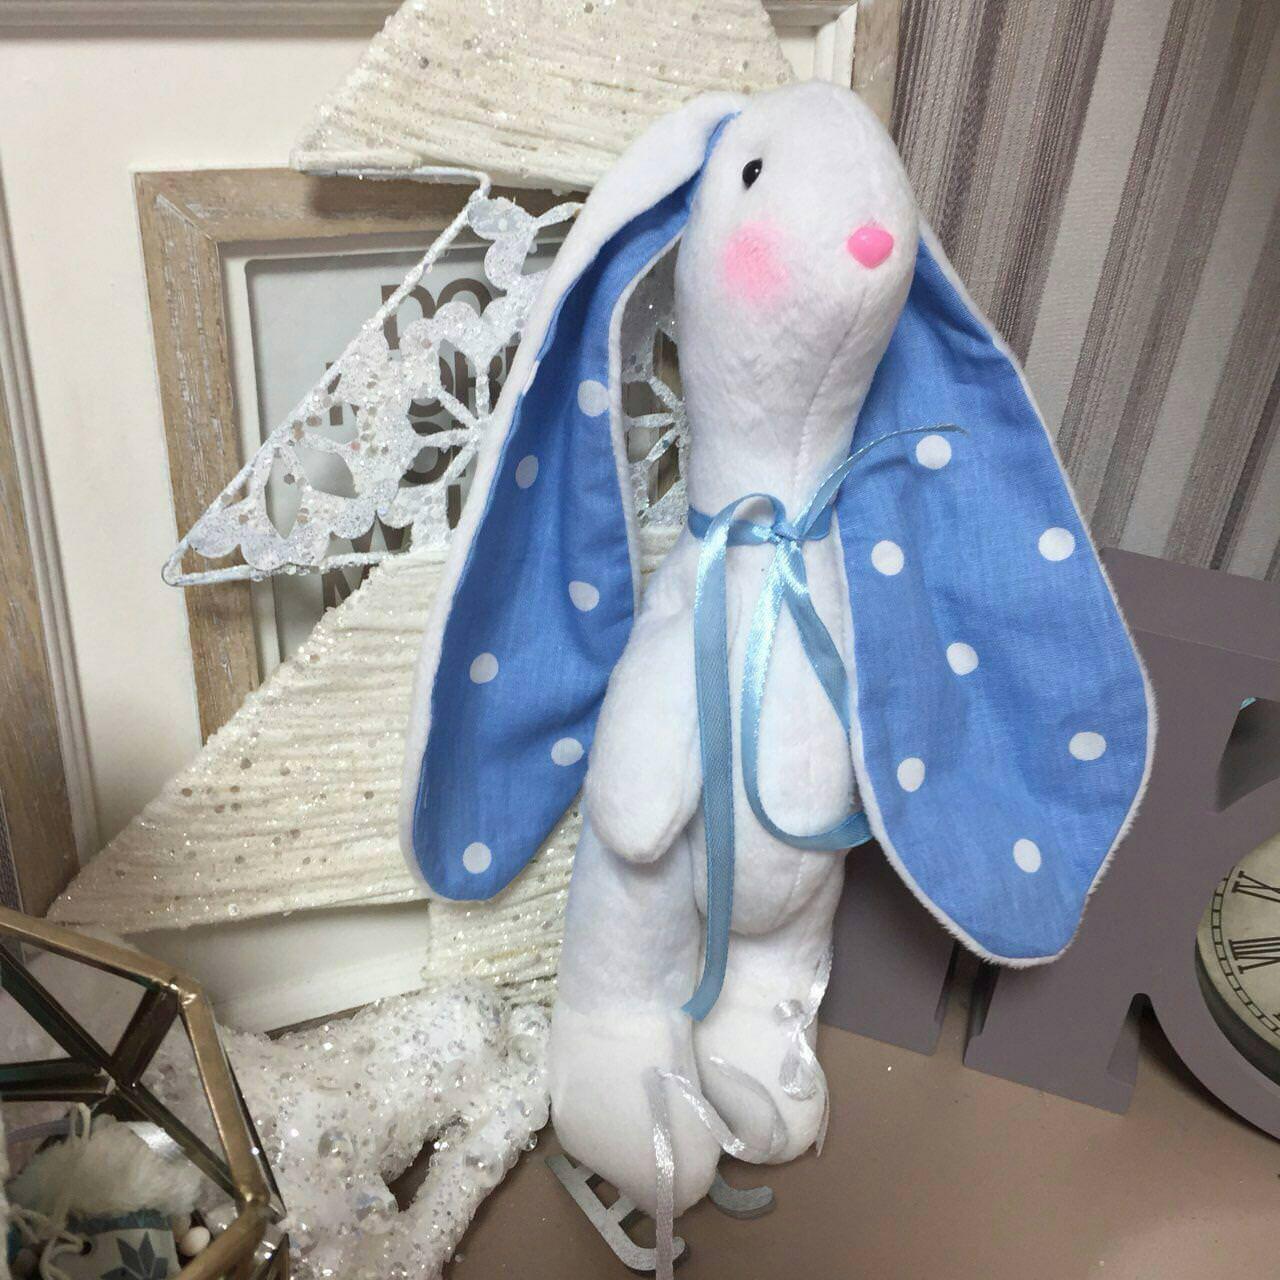 Кукла-тильда заяц фигурист